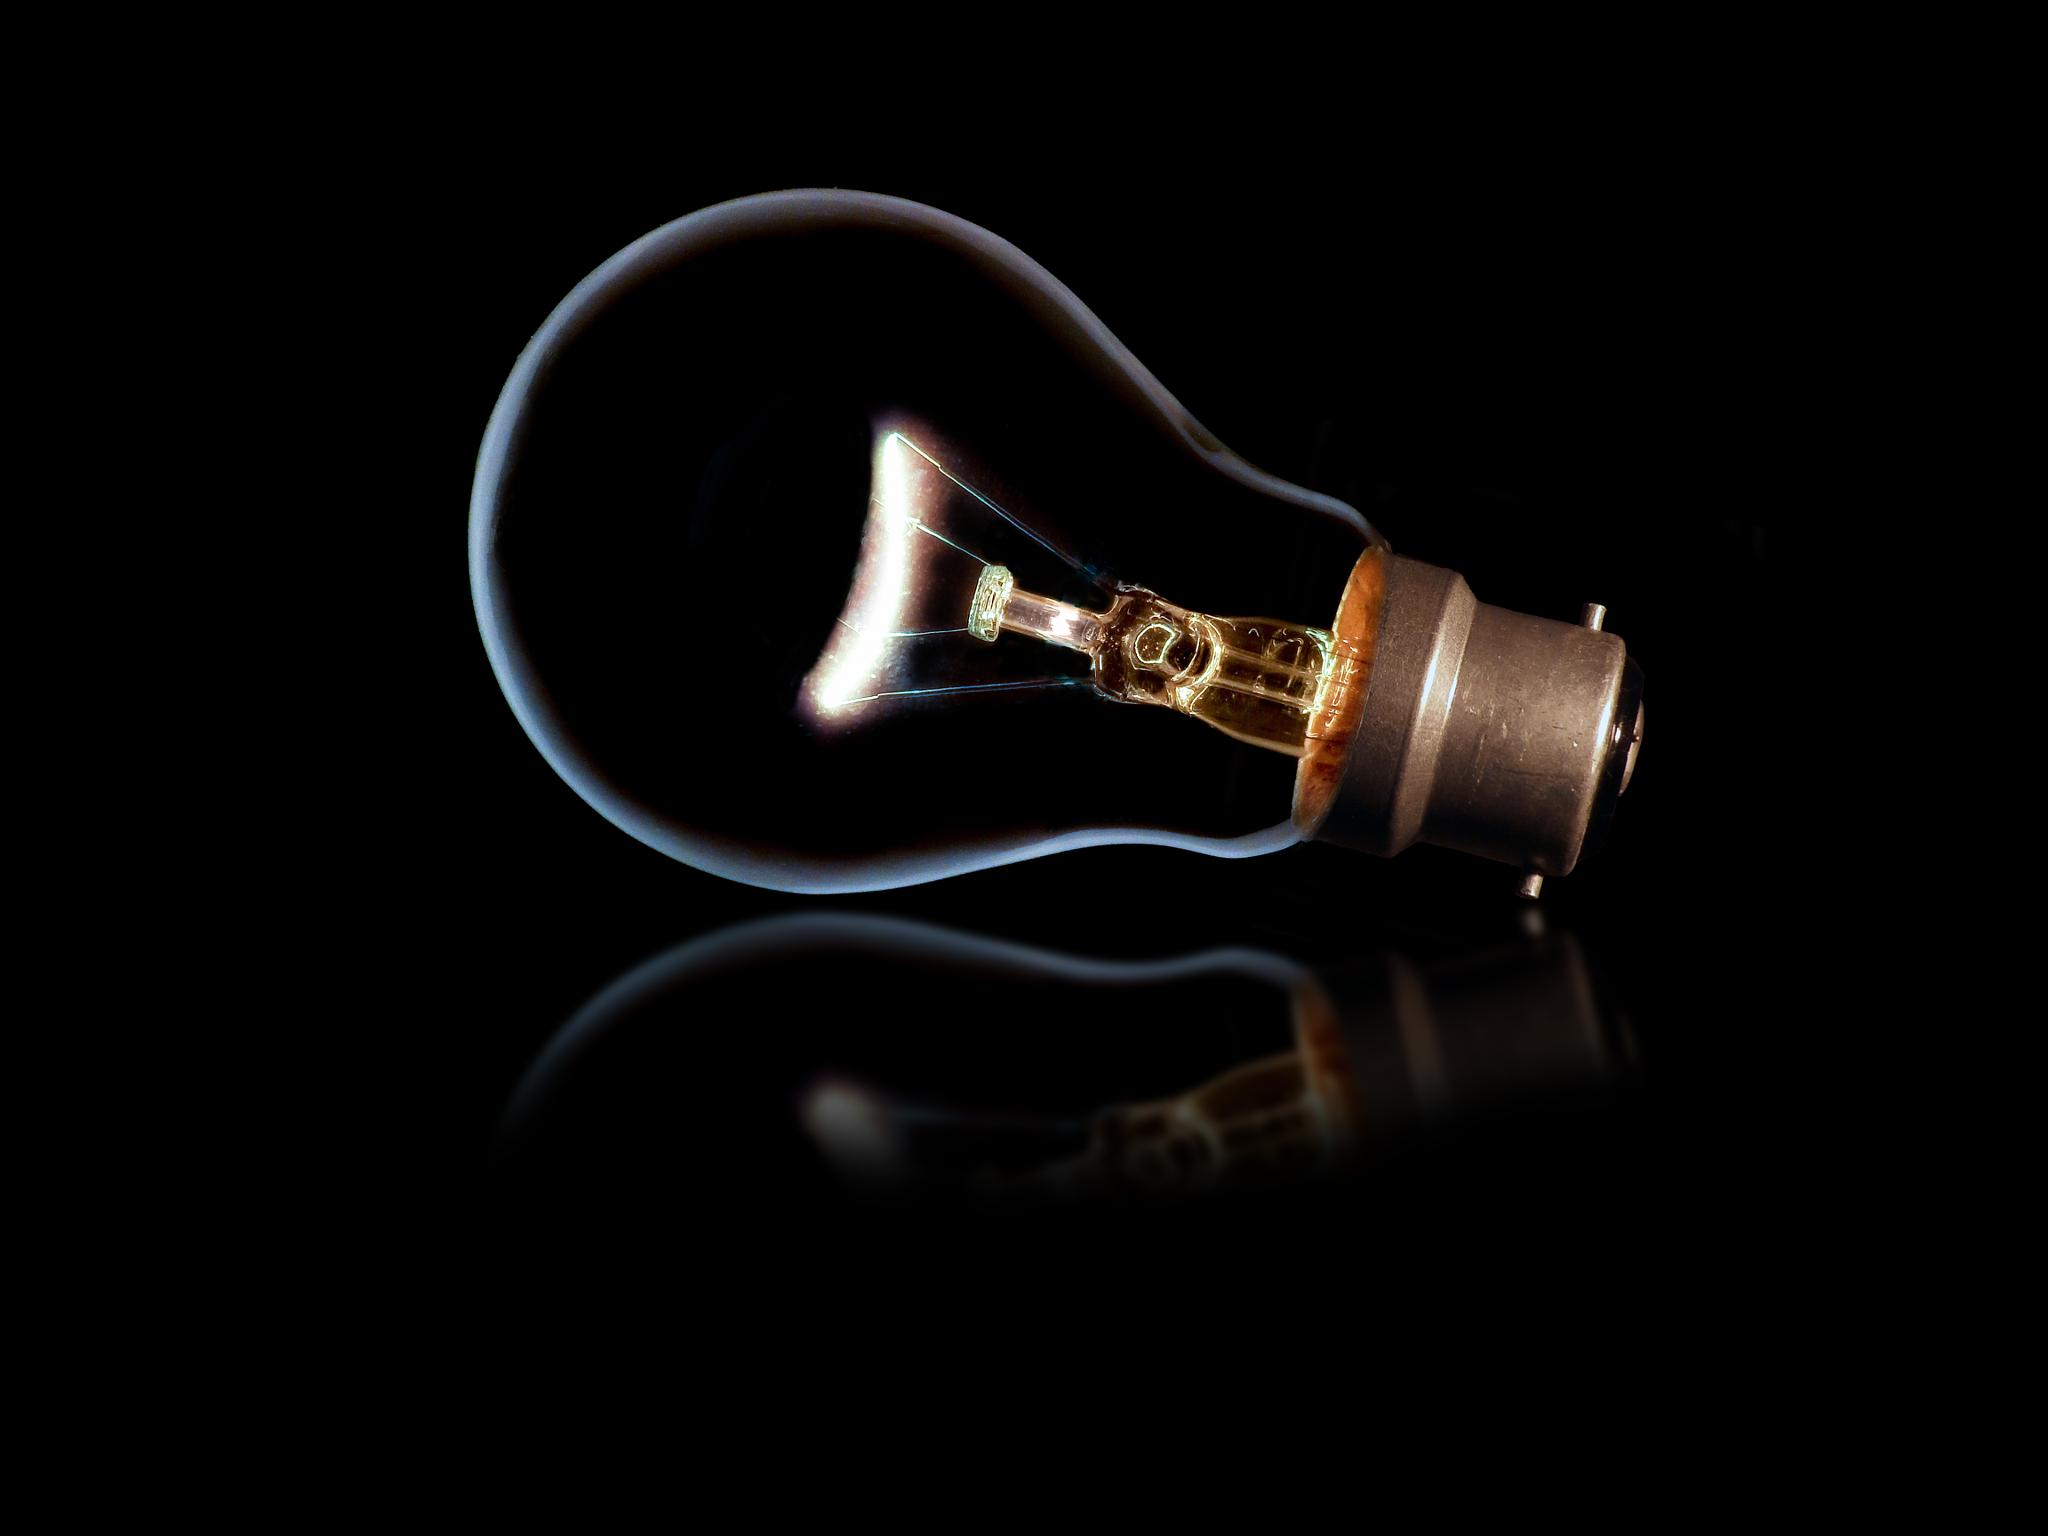 Magical Light Bulb by Reuben Kinny